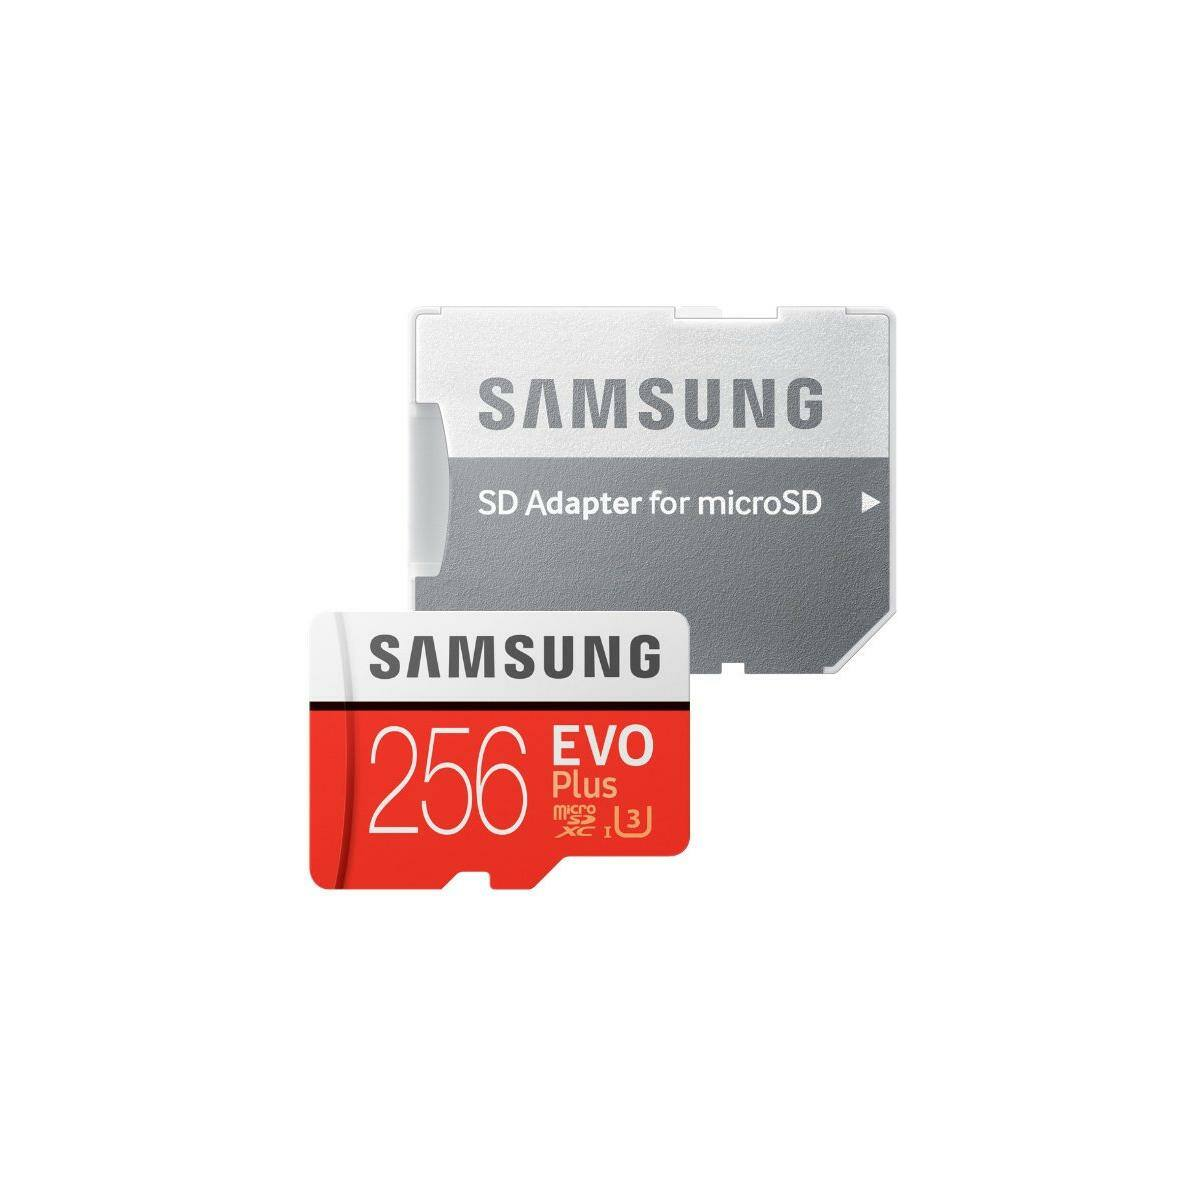 Samsung MicroSD Card EVO+ 256GB Class10 + Adapter MB-MC256HAEU